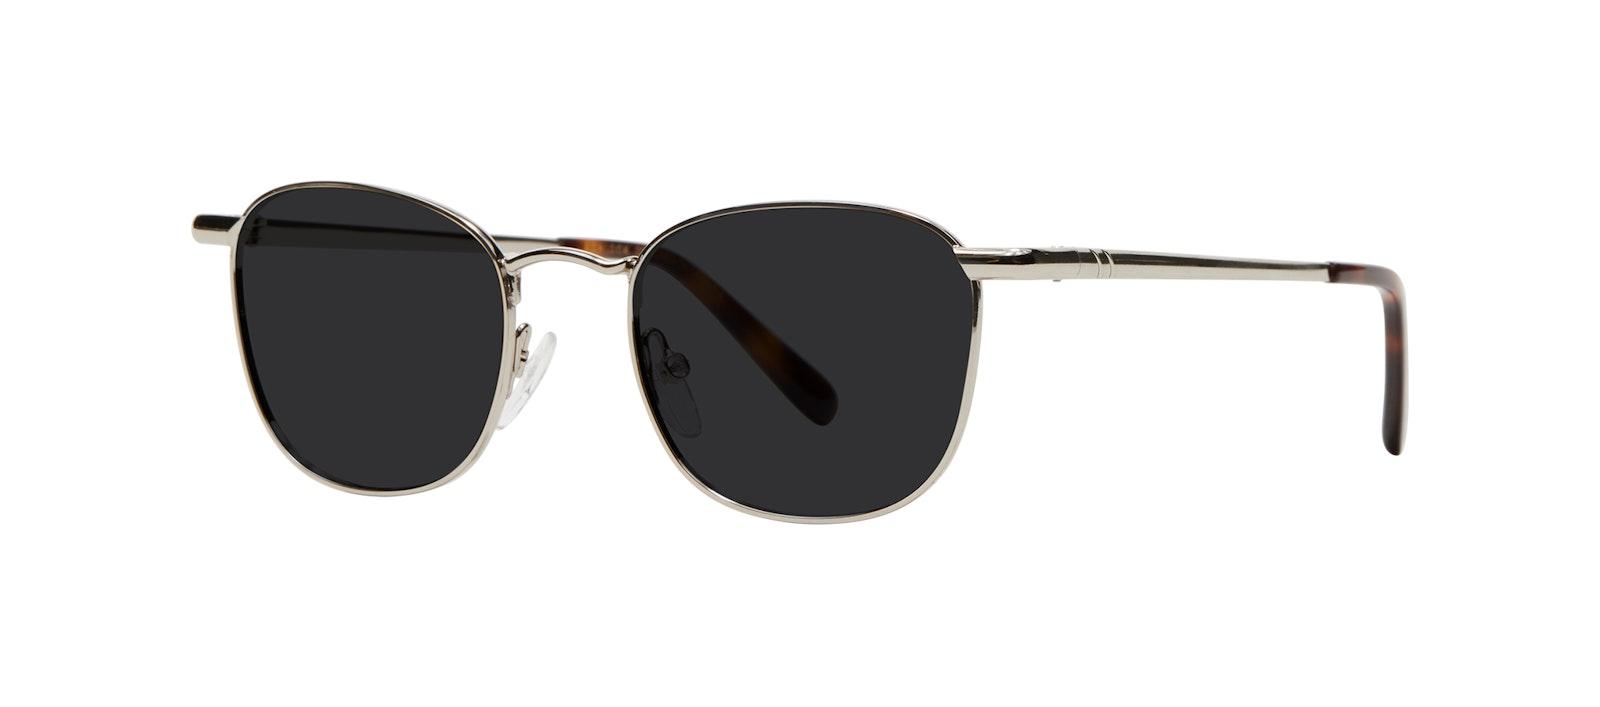 Affordable Fashion Glasses Square Sunglasses Men Apex S Silver Tilt